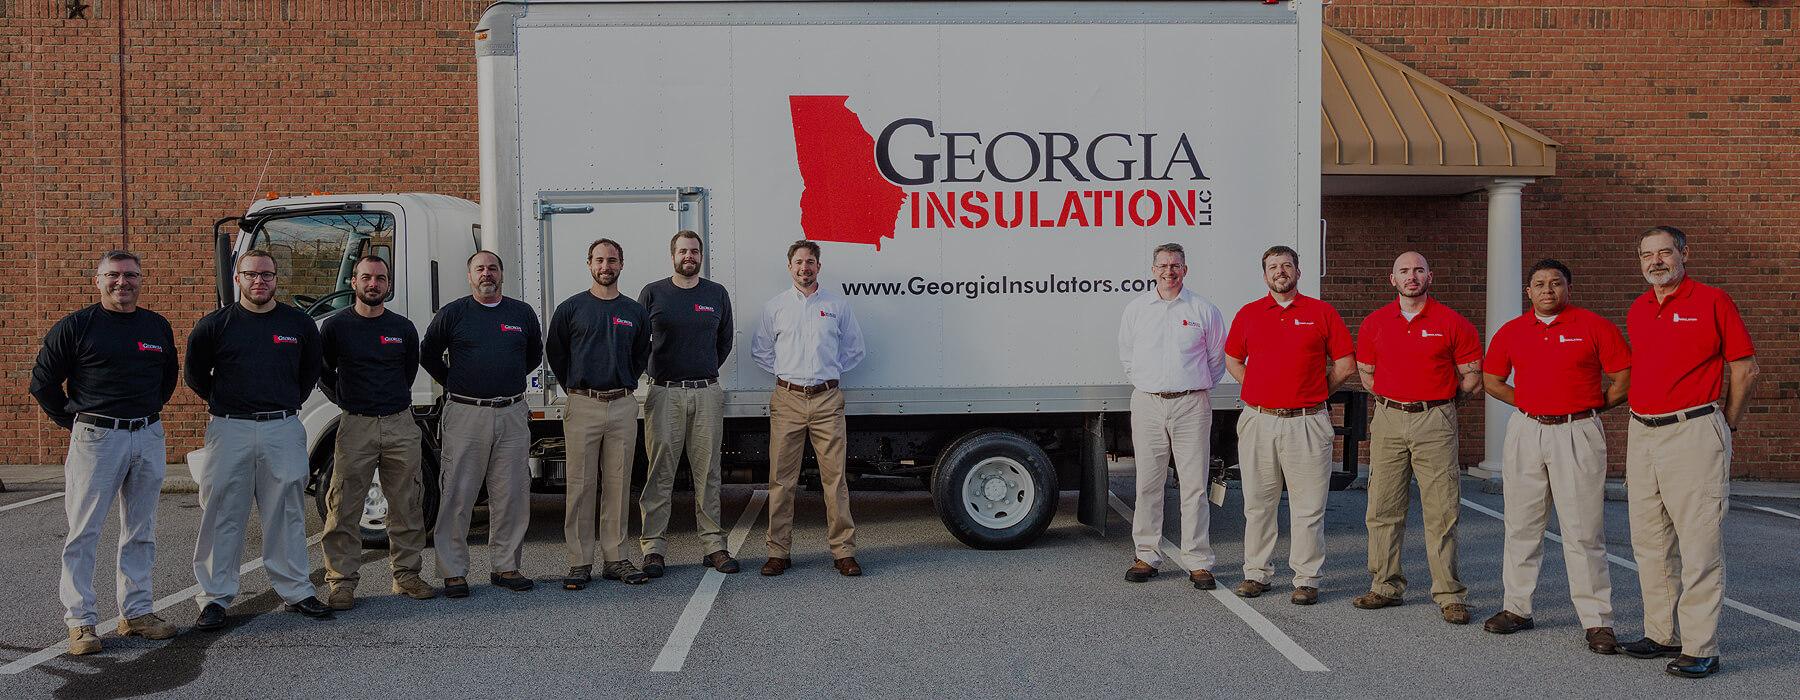 Georgia Insulation